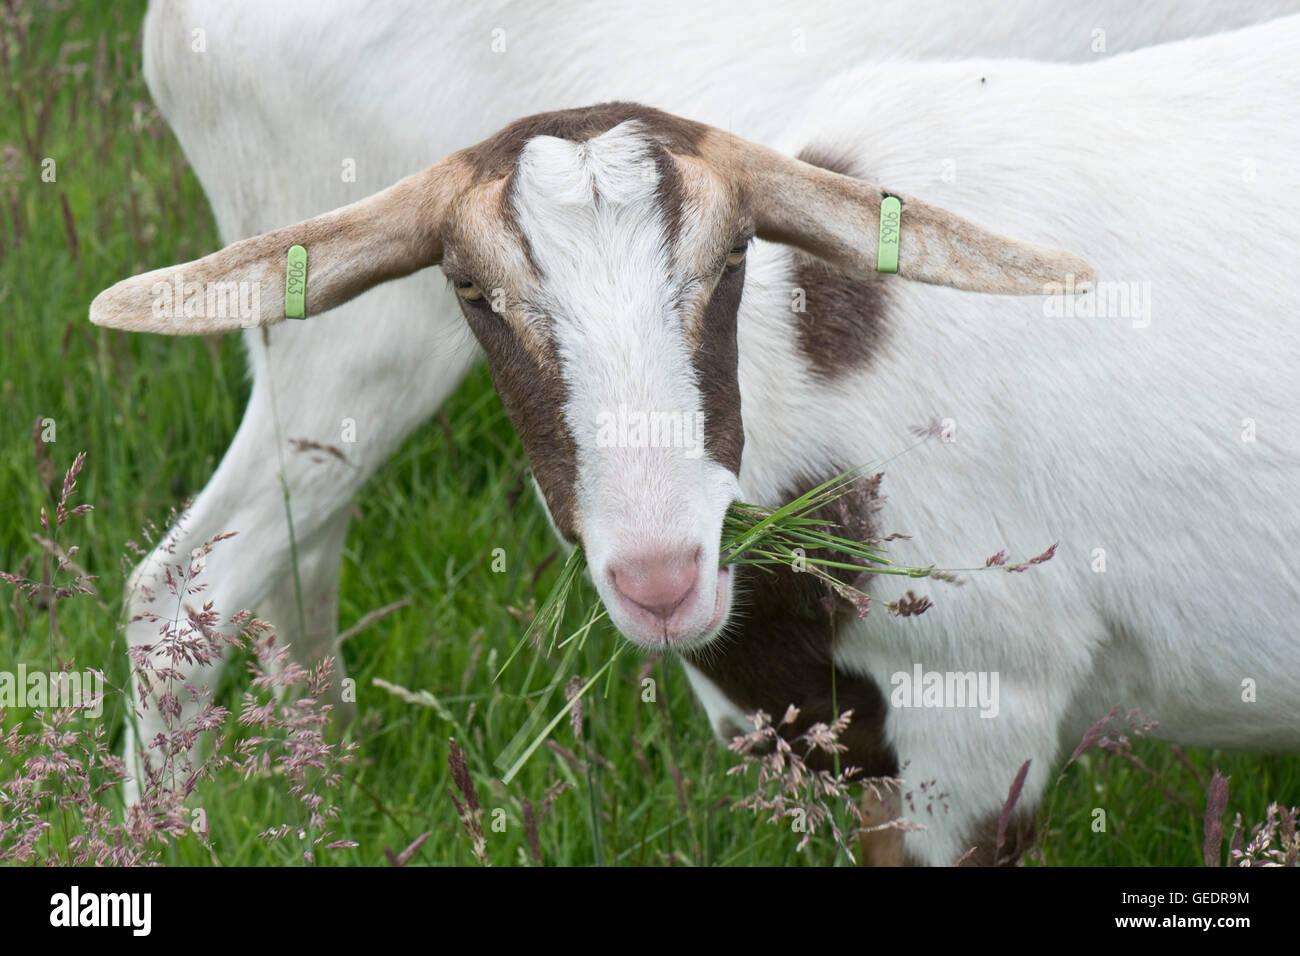 Boer type nanny goat grazing flowering Yorkshire fog grass, Holcus lanatus, June - Stock Image